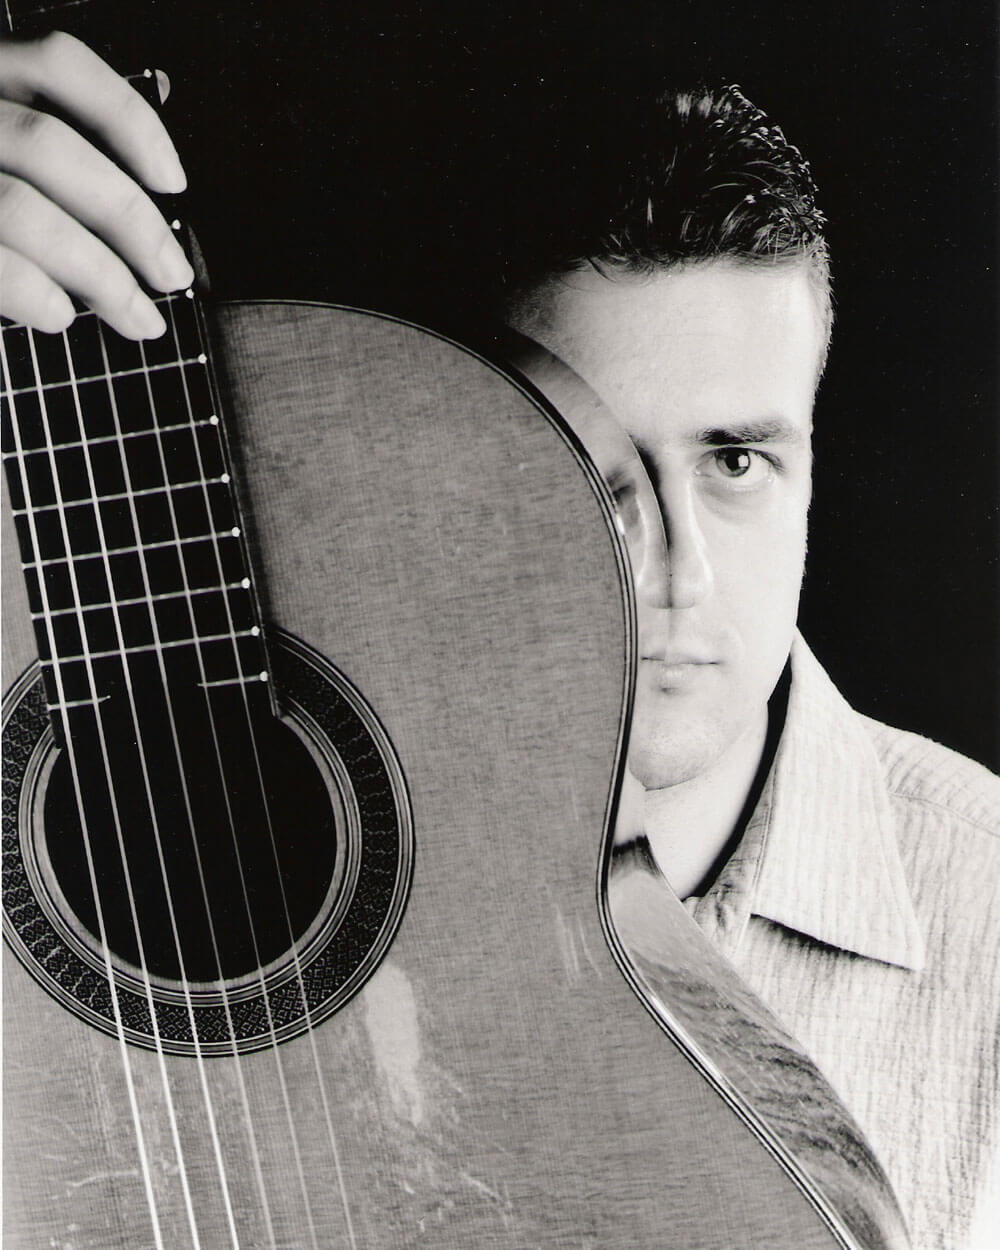 Goran discography